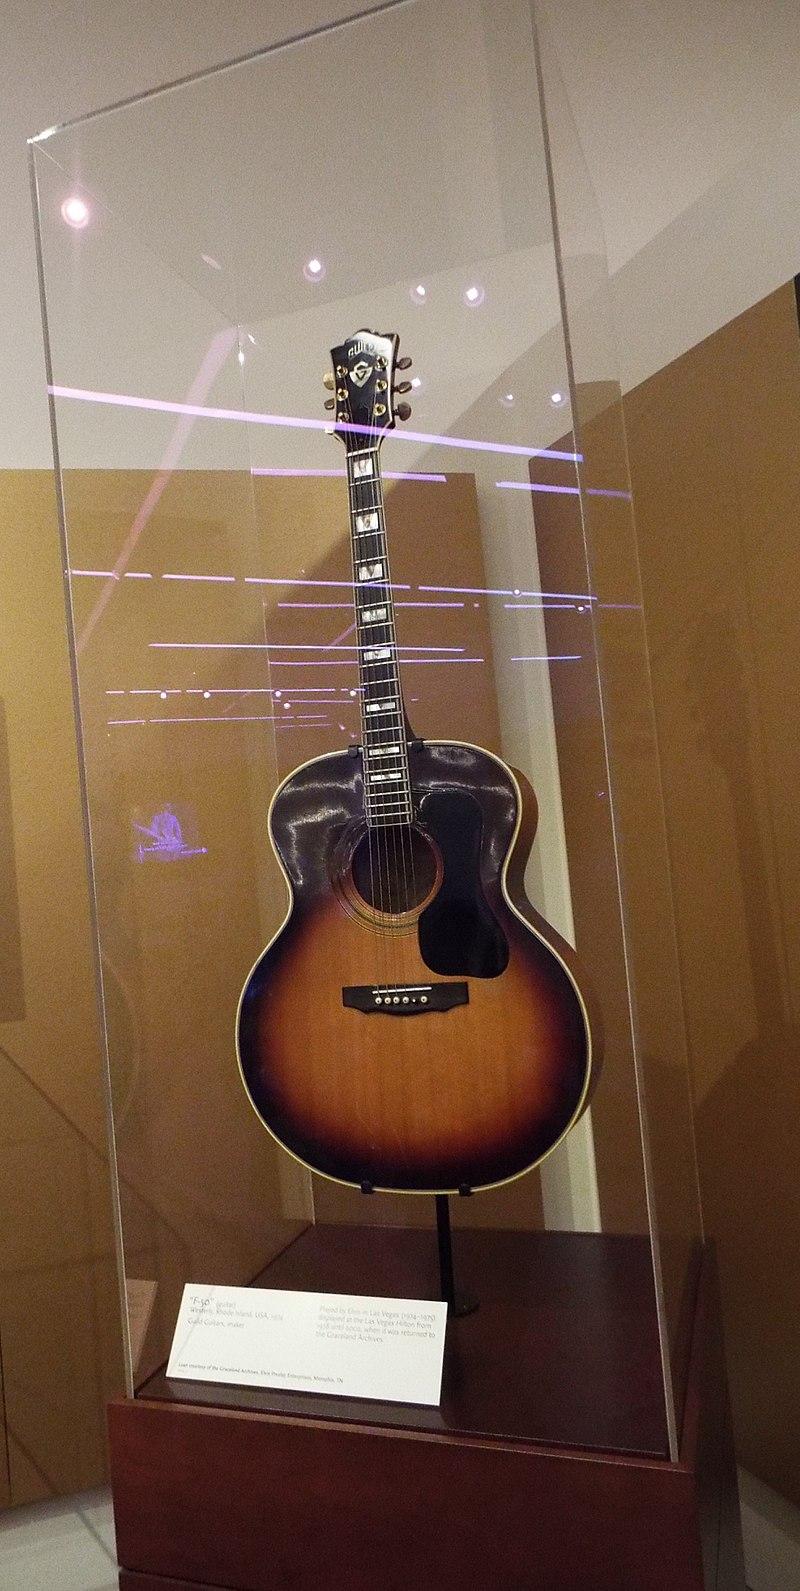 Phoenix-Musical Intrument Museum-Elavis Presely exhibit-2.jpg